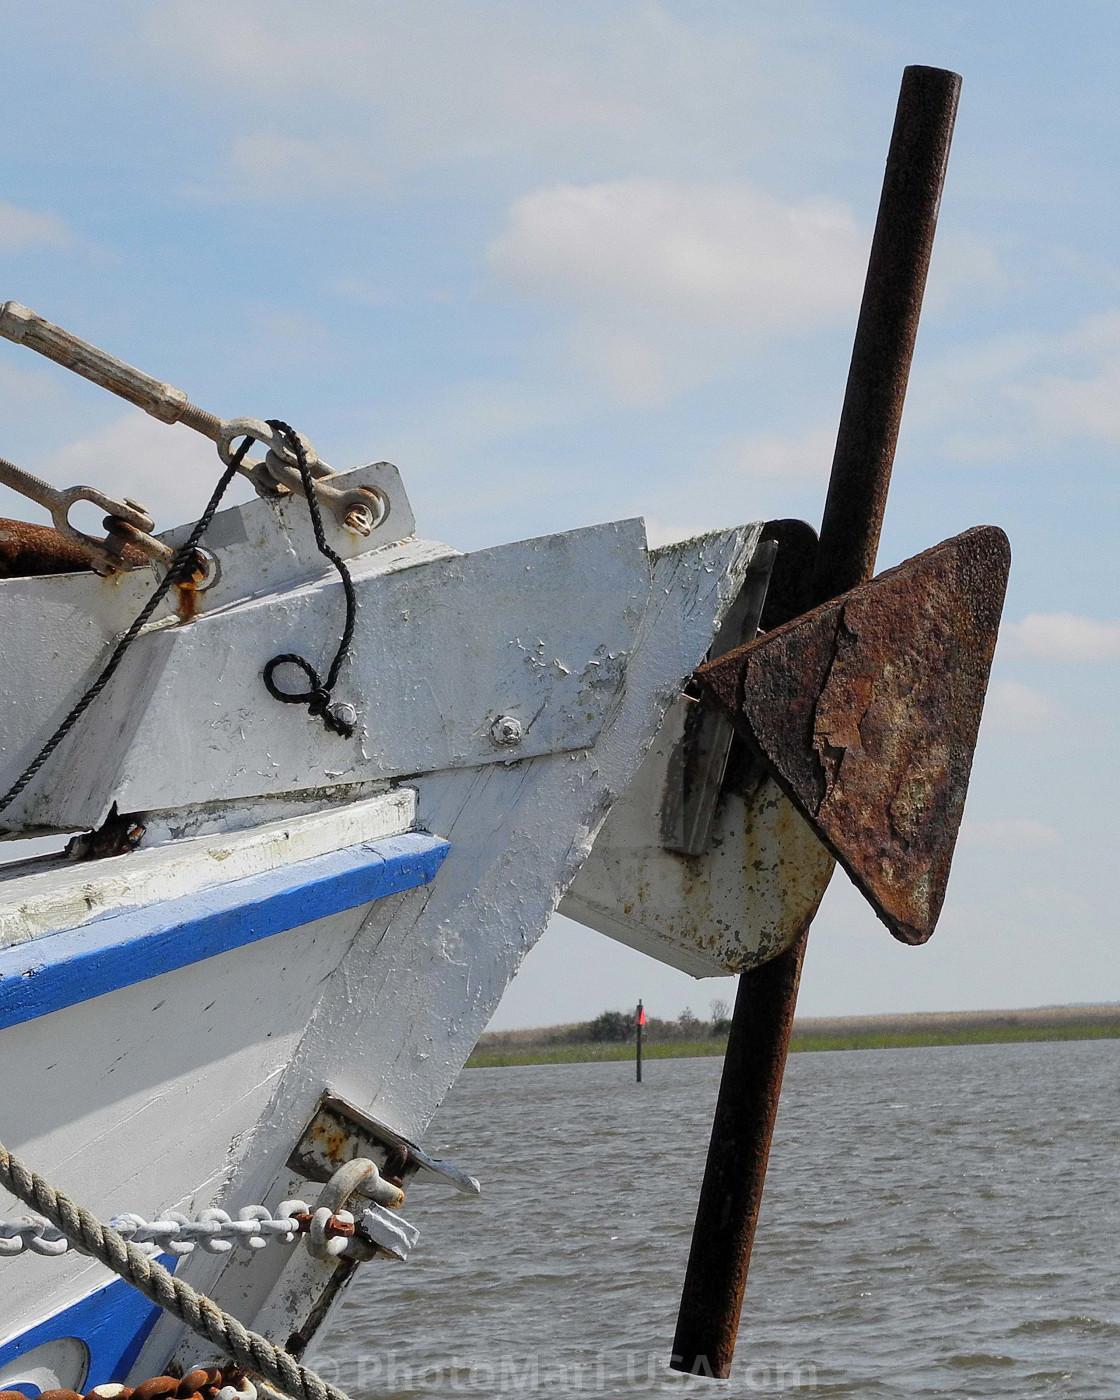 """ANCHOR AWAY SHIP MATES"" stock image"